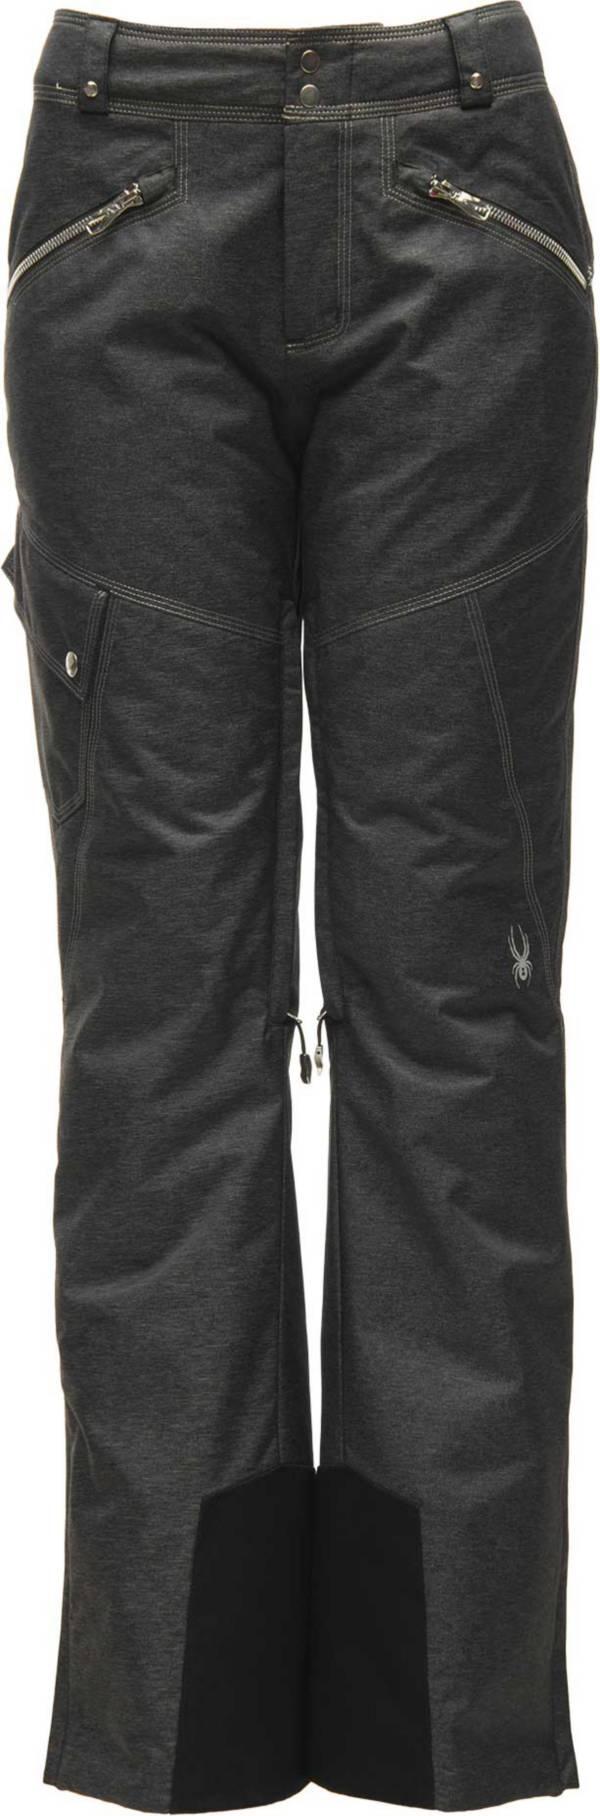 Spyder Women's Me Pants product image